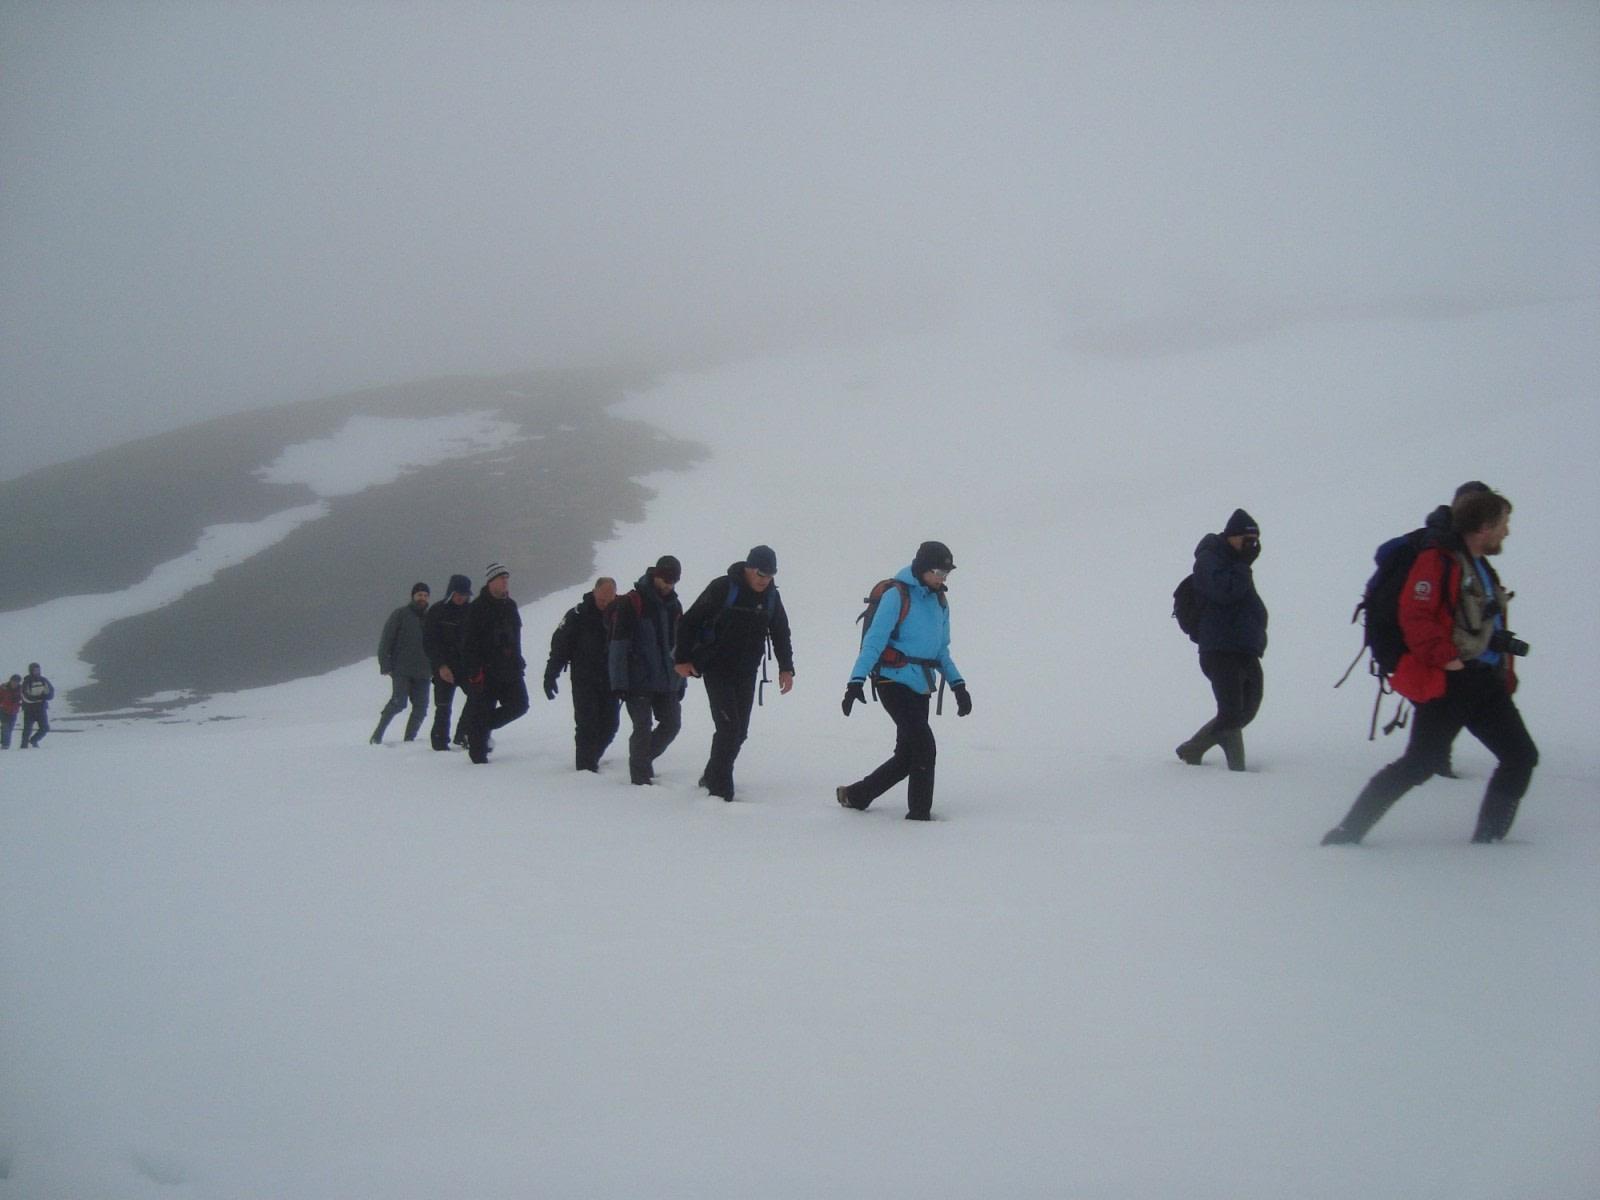 Hike to Kvalrossbukta on Jan Mayen